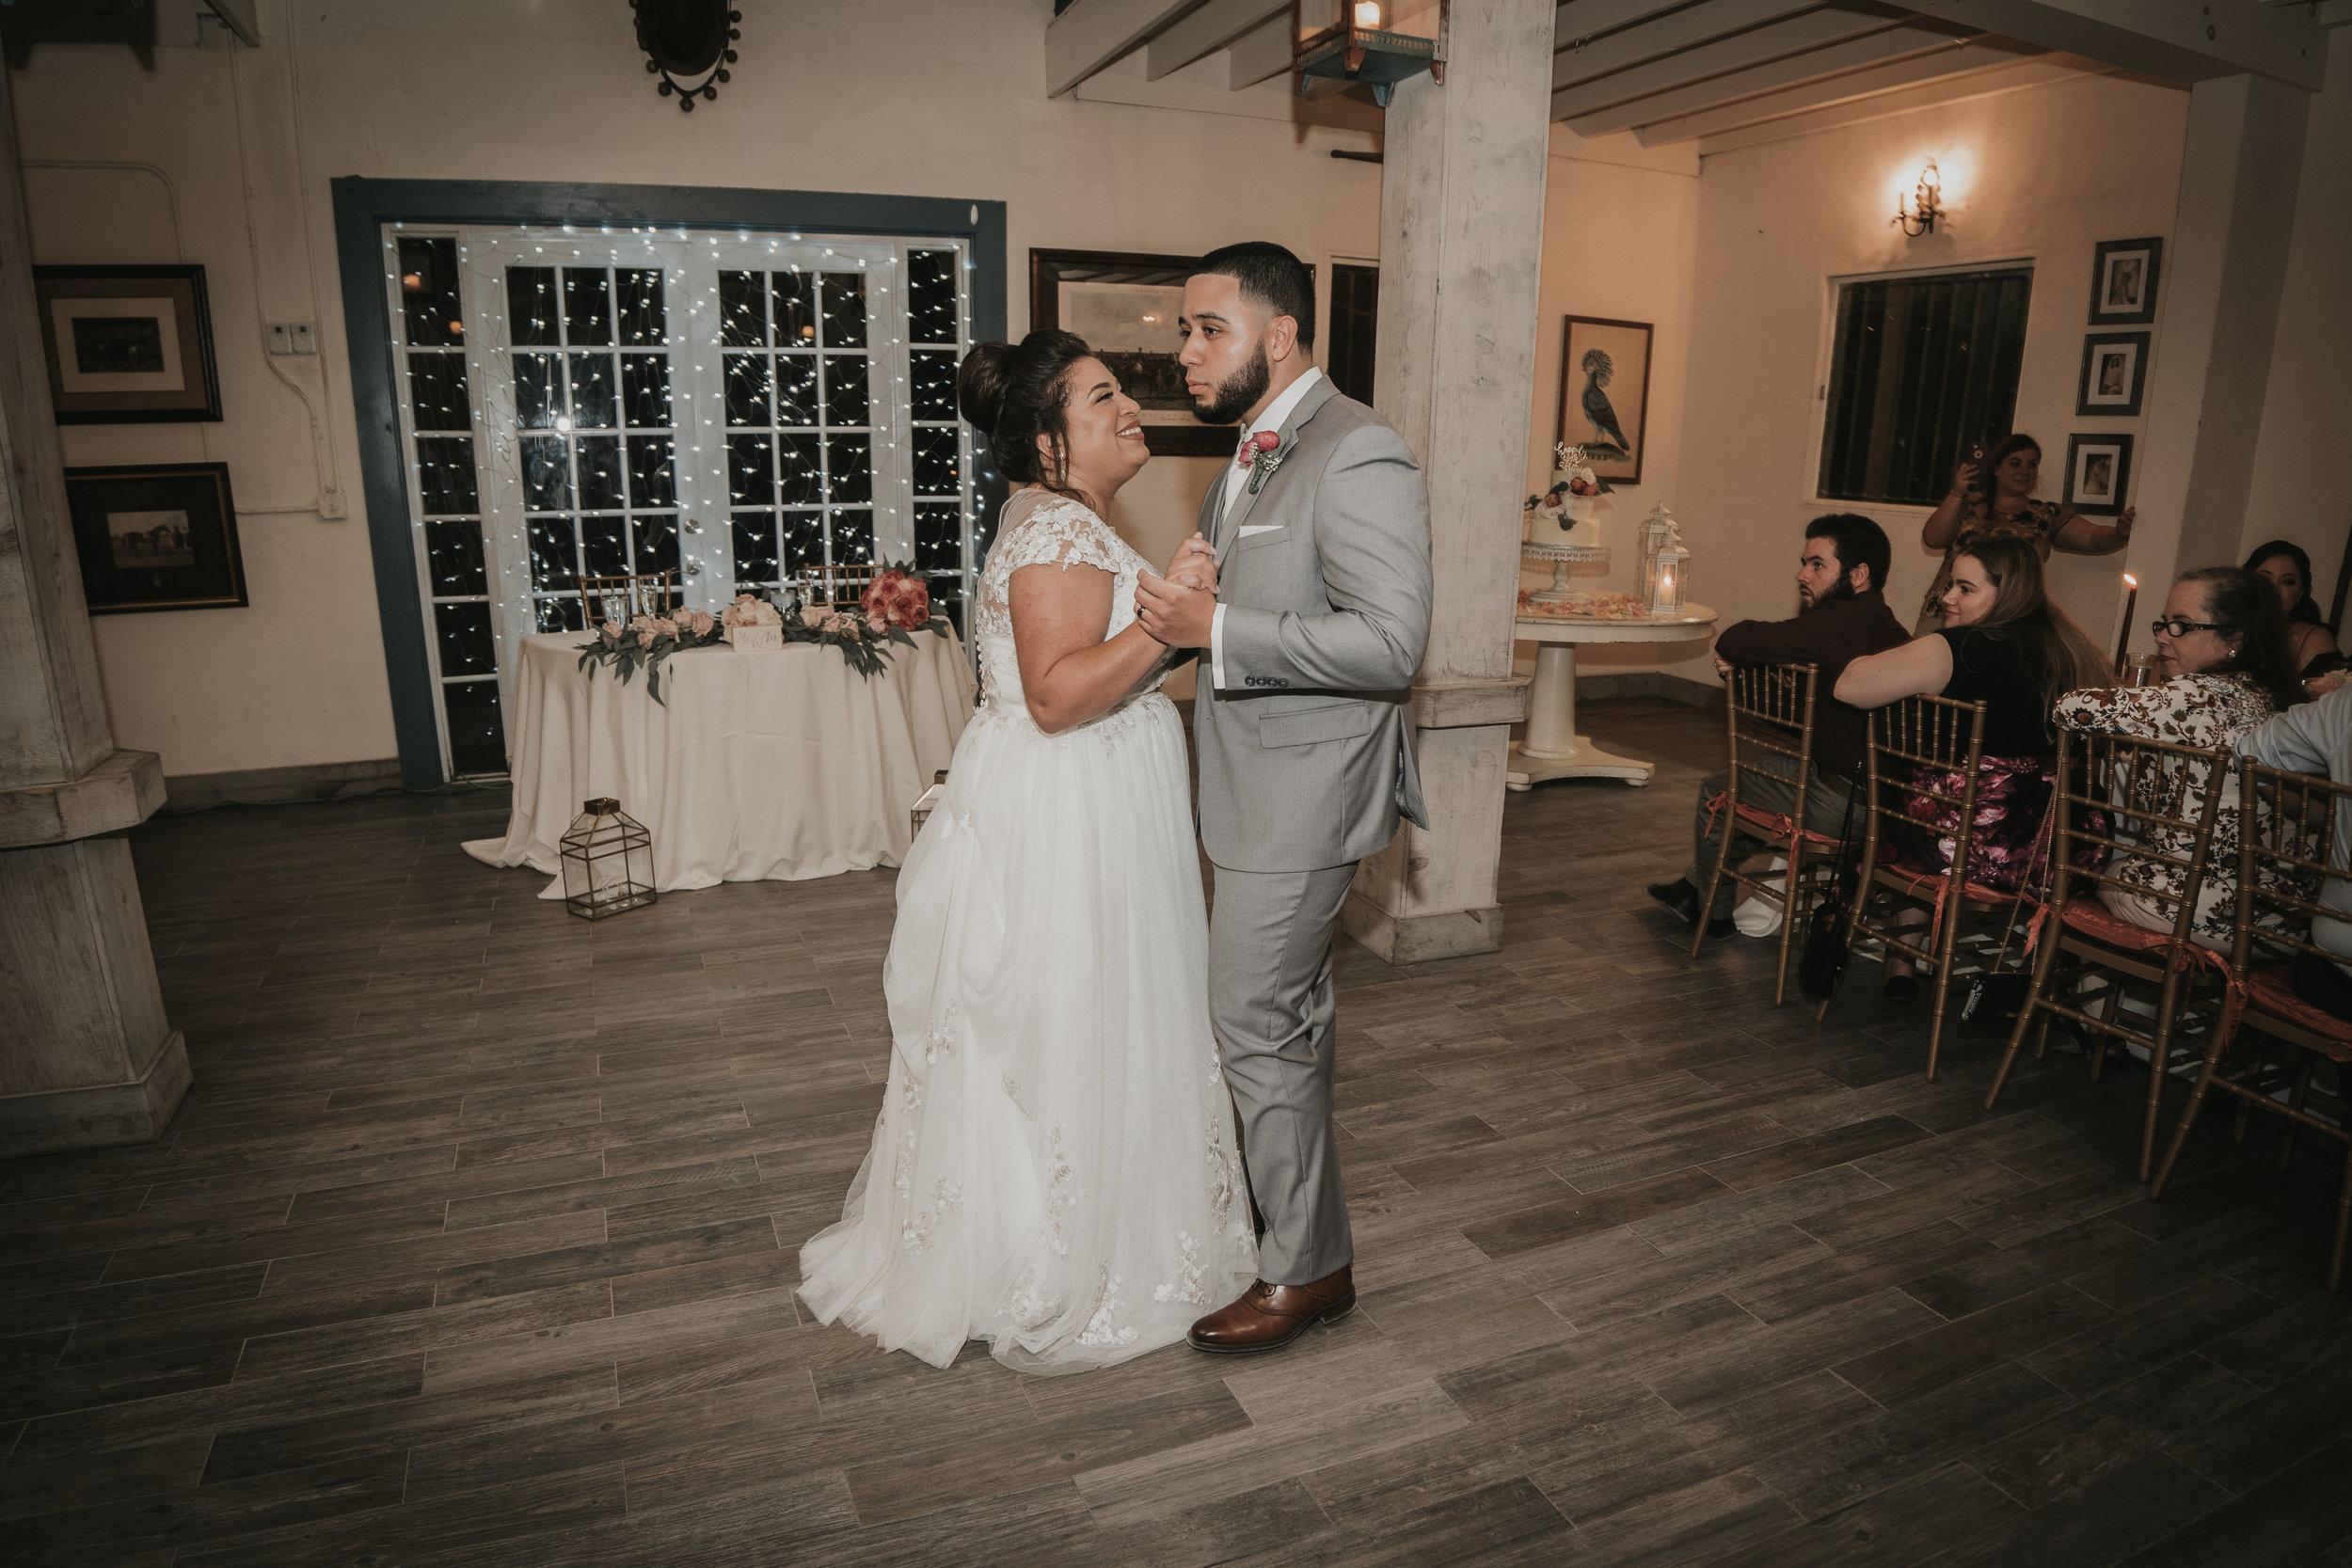 389MICHI&GABEWEDDINGDAY(WeddingFinal).jpg